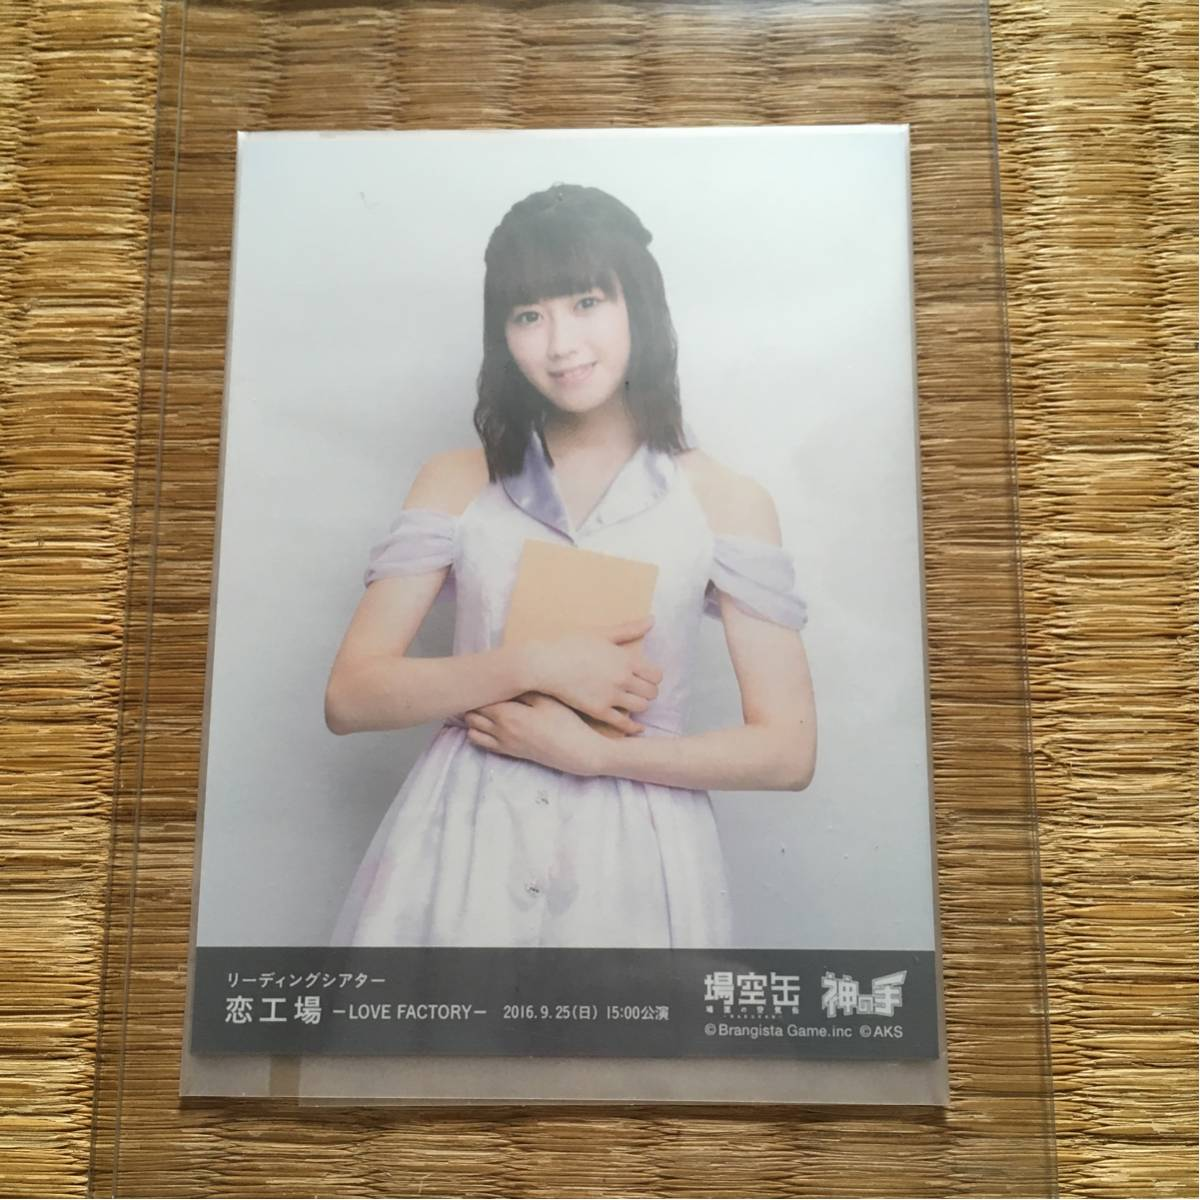 NGT48 西潟茉莉奈 リーディングシアター 恋工場 場空缶 神の手 生写真 ライブグッズの画像